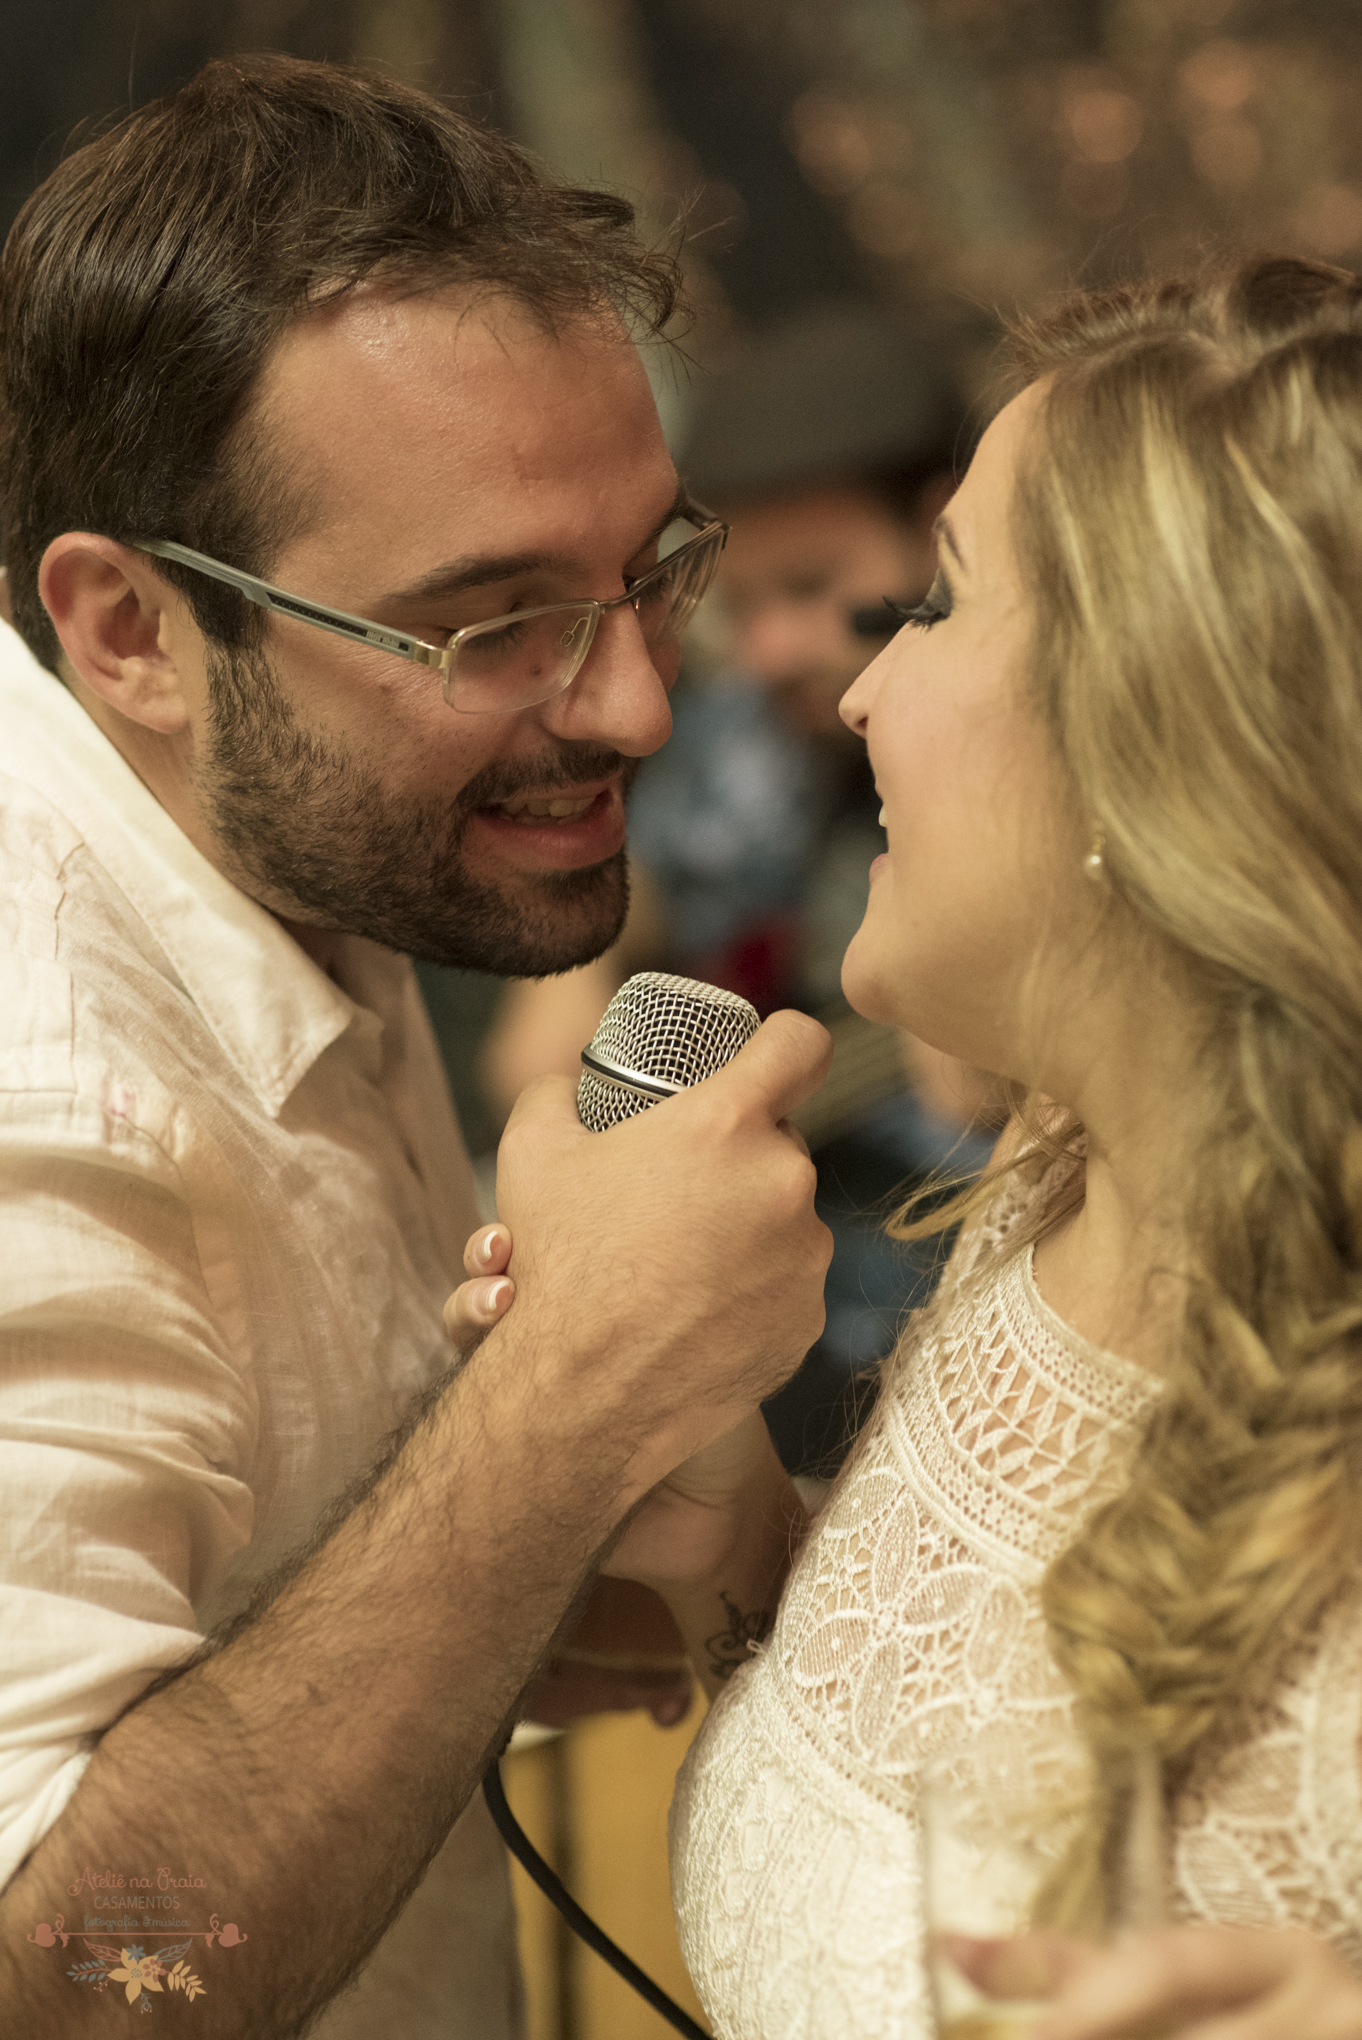 08-Festa-Atelie-na-Praia-Casamento-na-Praia-Erica-Daniel-9699